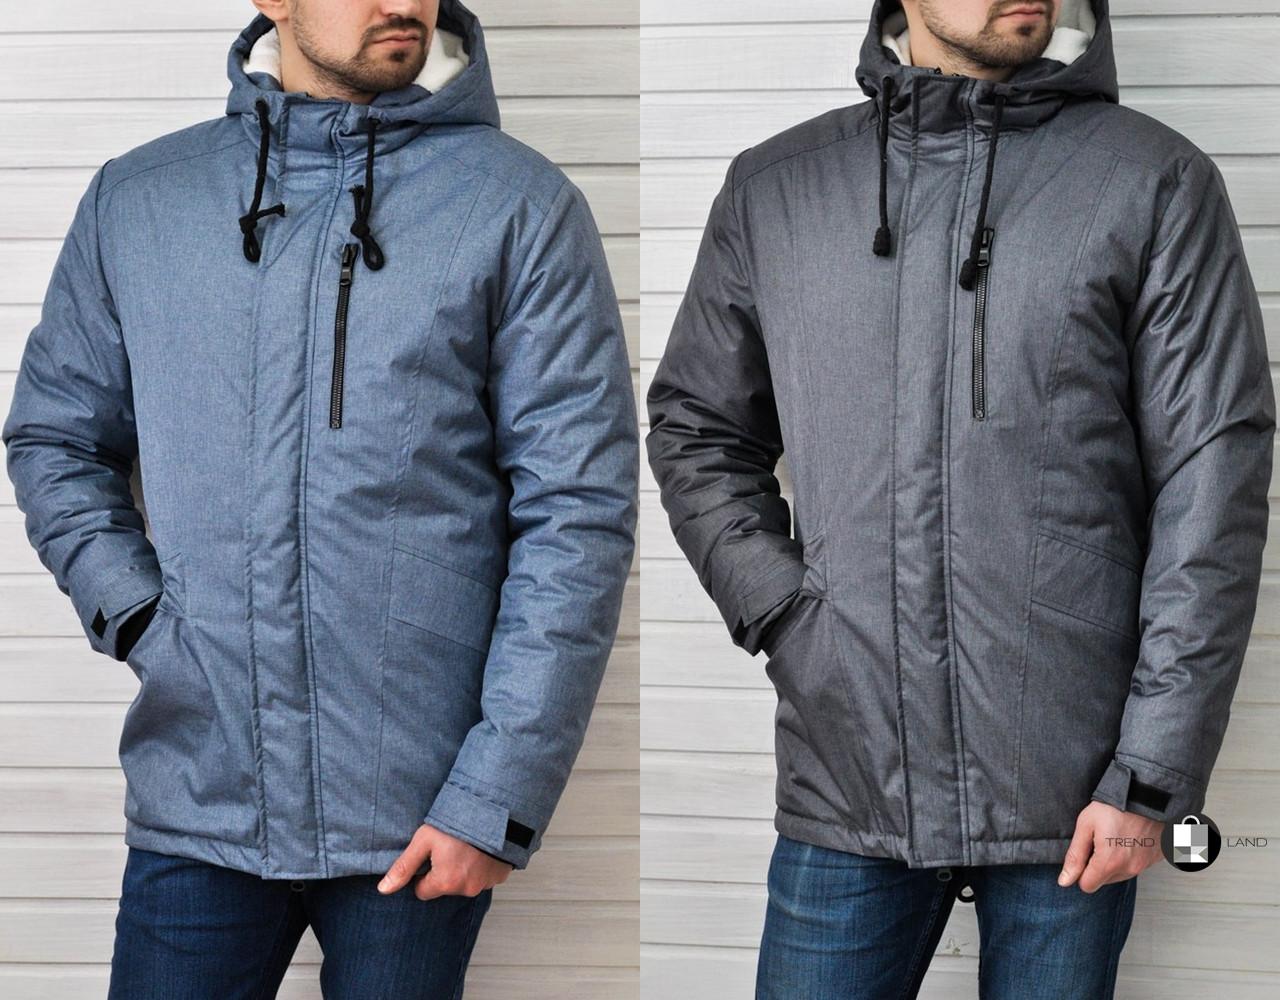 Мужская зимняя куртка Baterson Snowman 2 цвета - Интернет-магазин